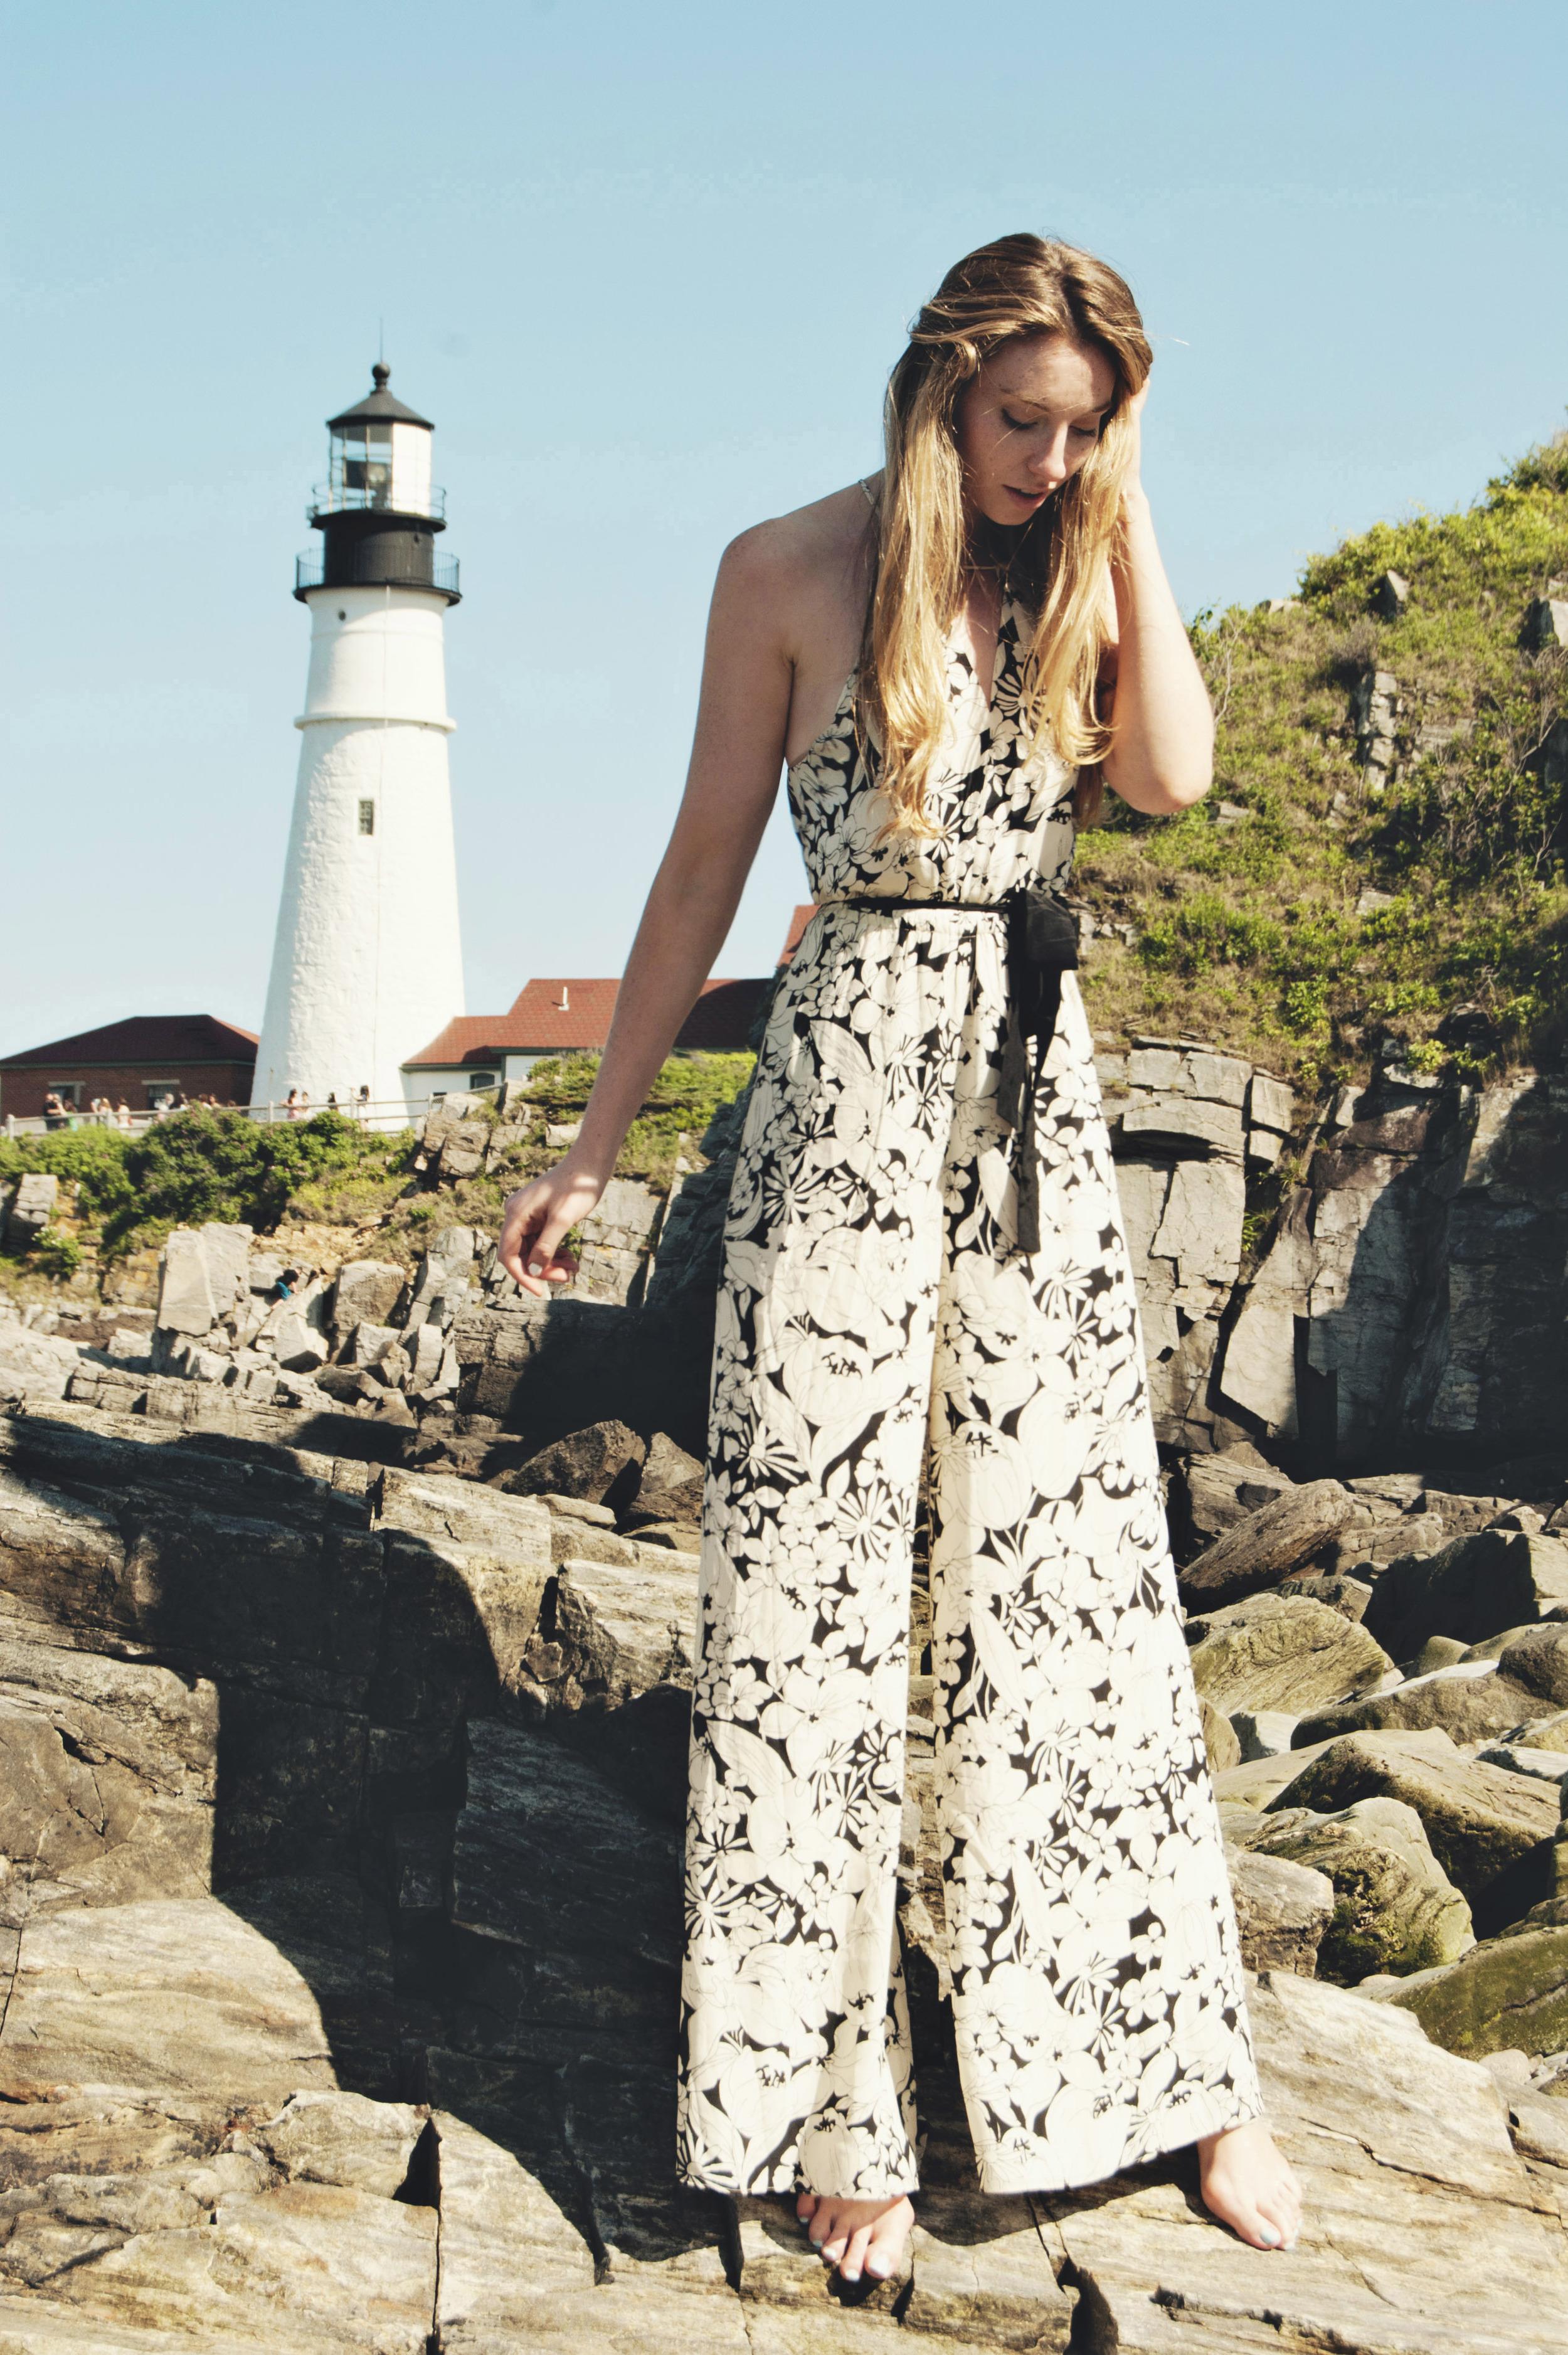 Floral Anthropologie Jumpsuit Romper (via Girl x Garment)